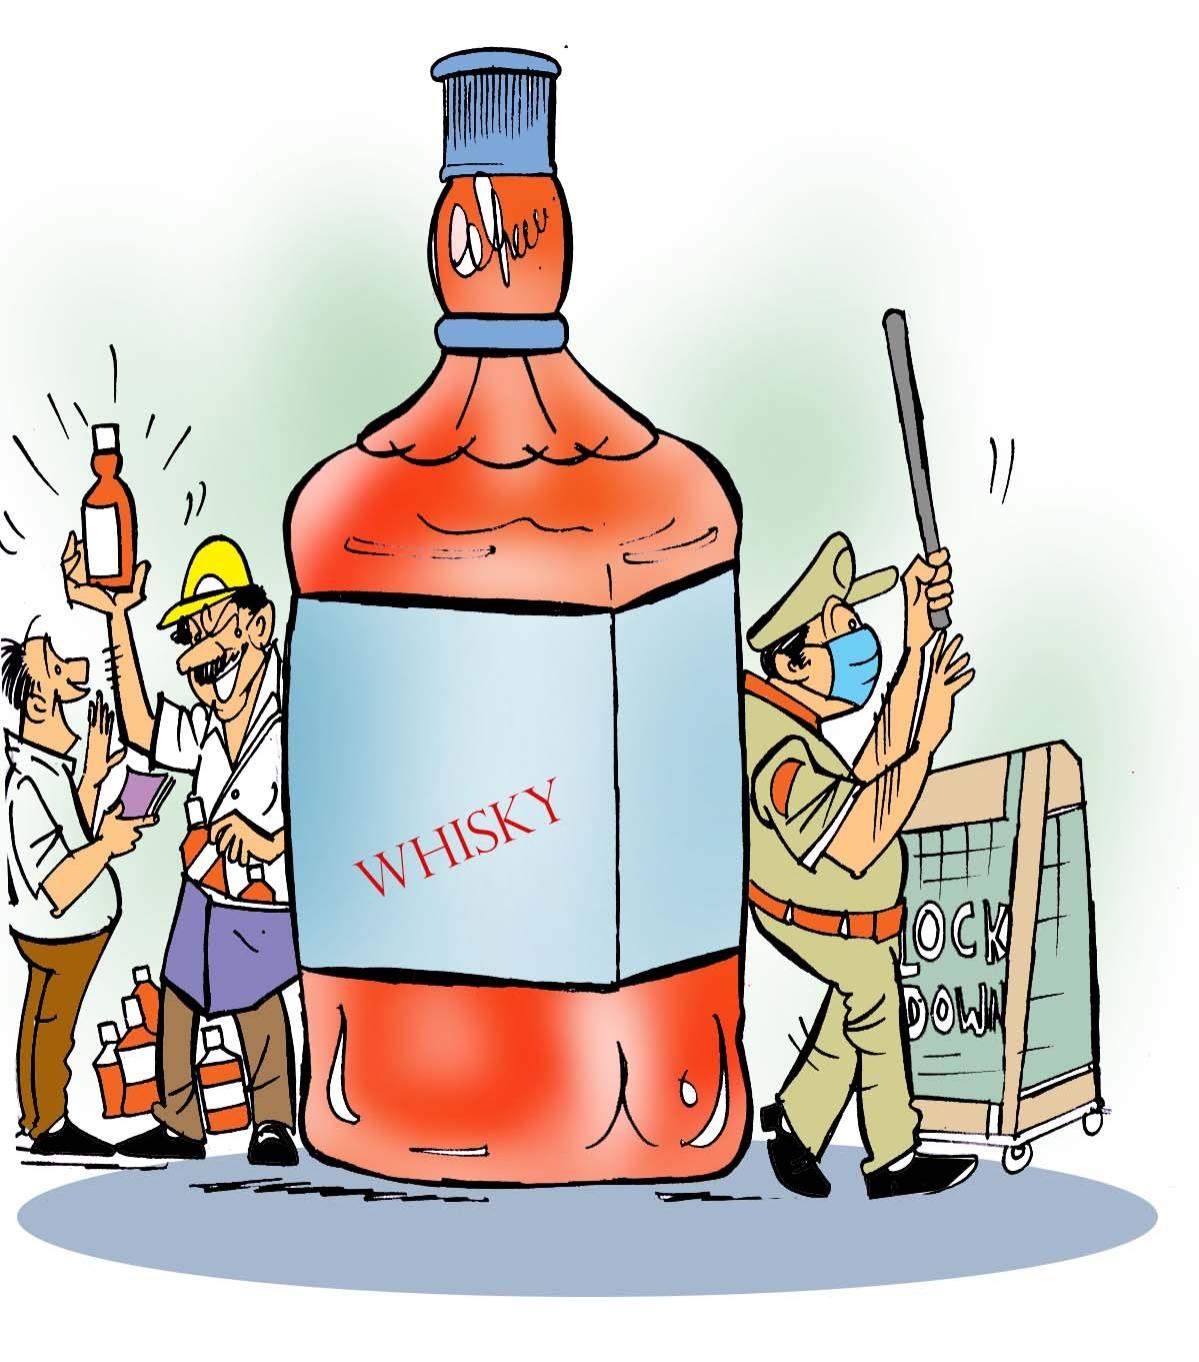 Bhopal: 'Pehelwans' flex their muscles, get into liquor black-marketing